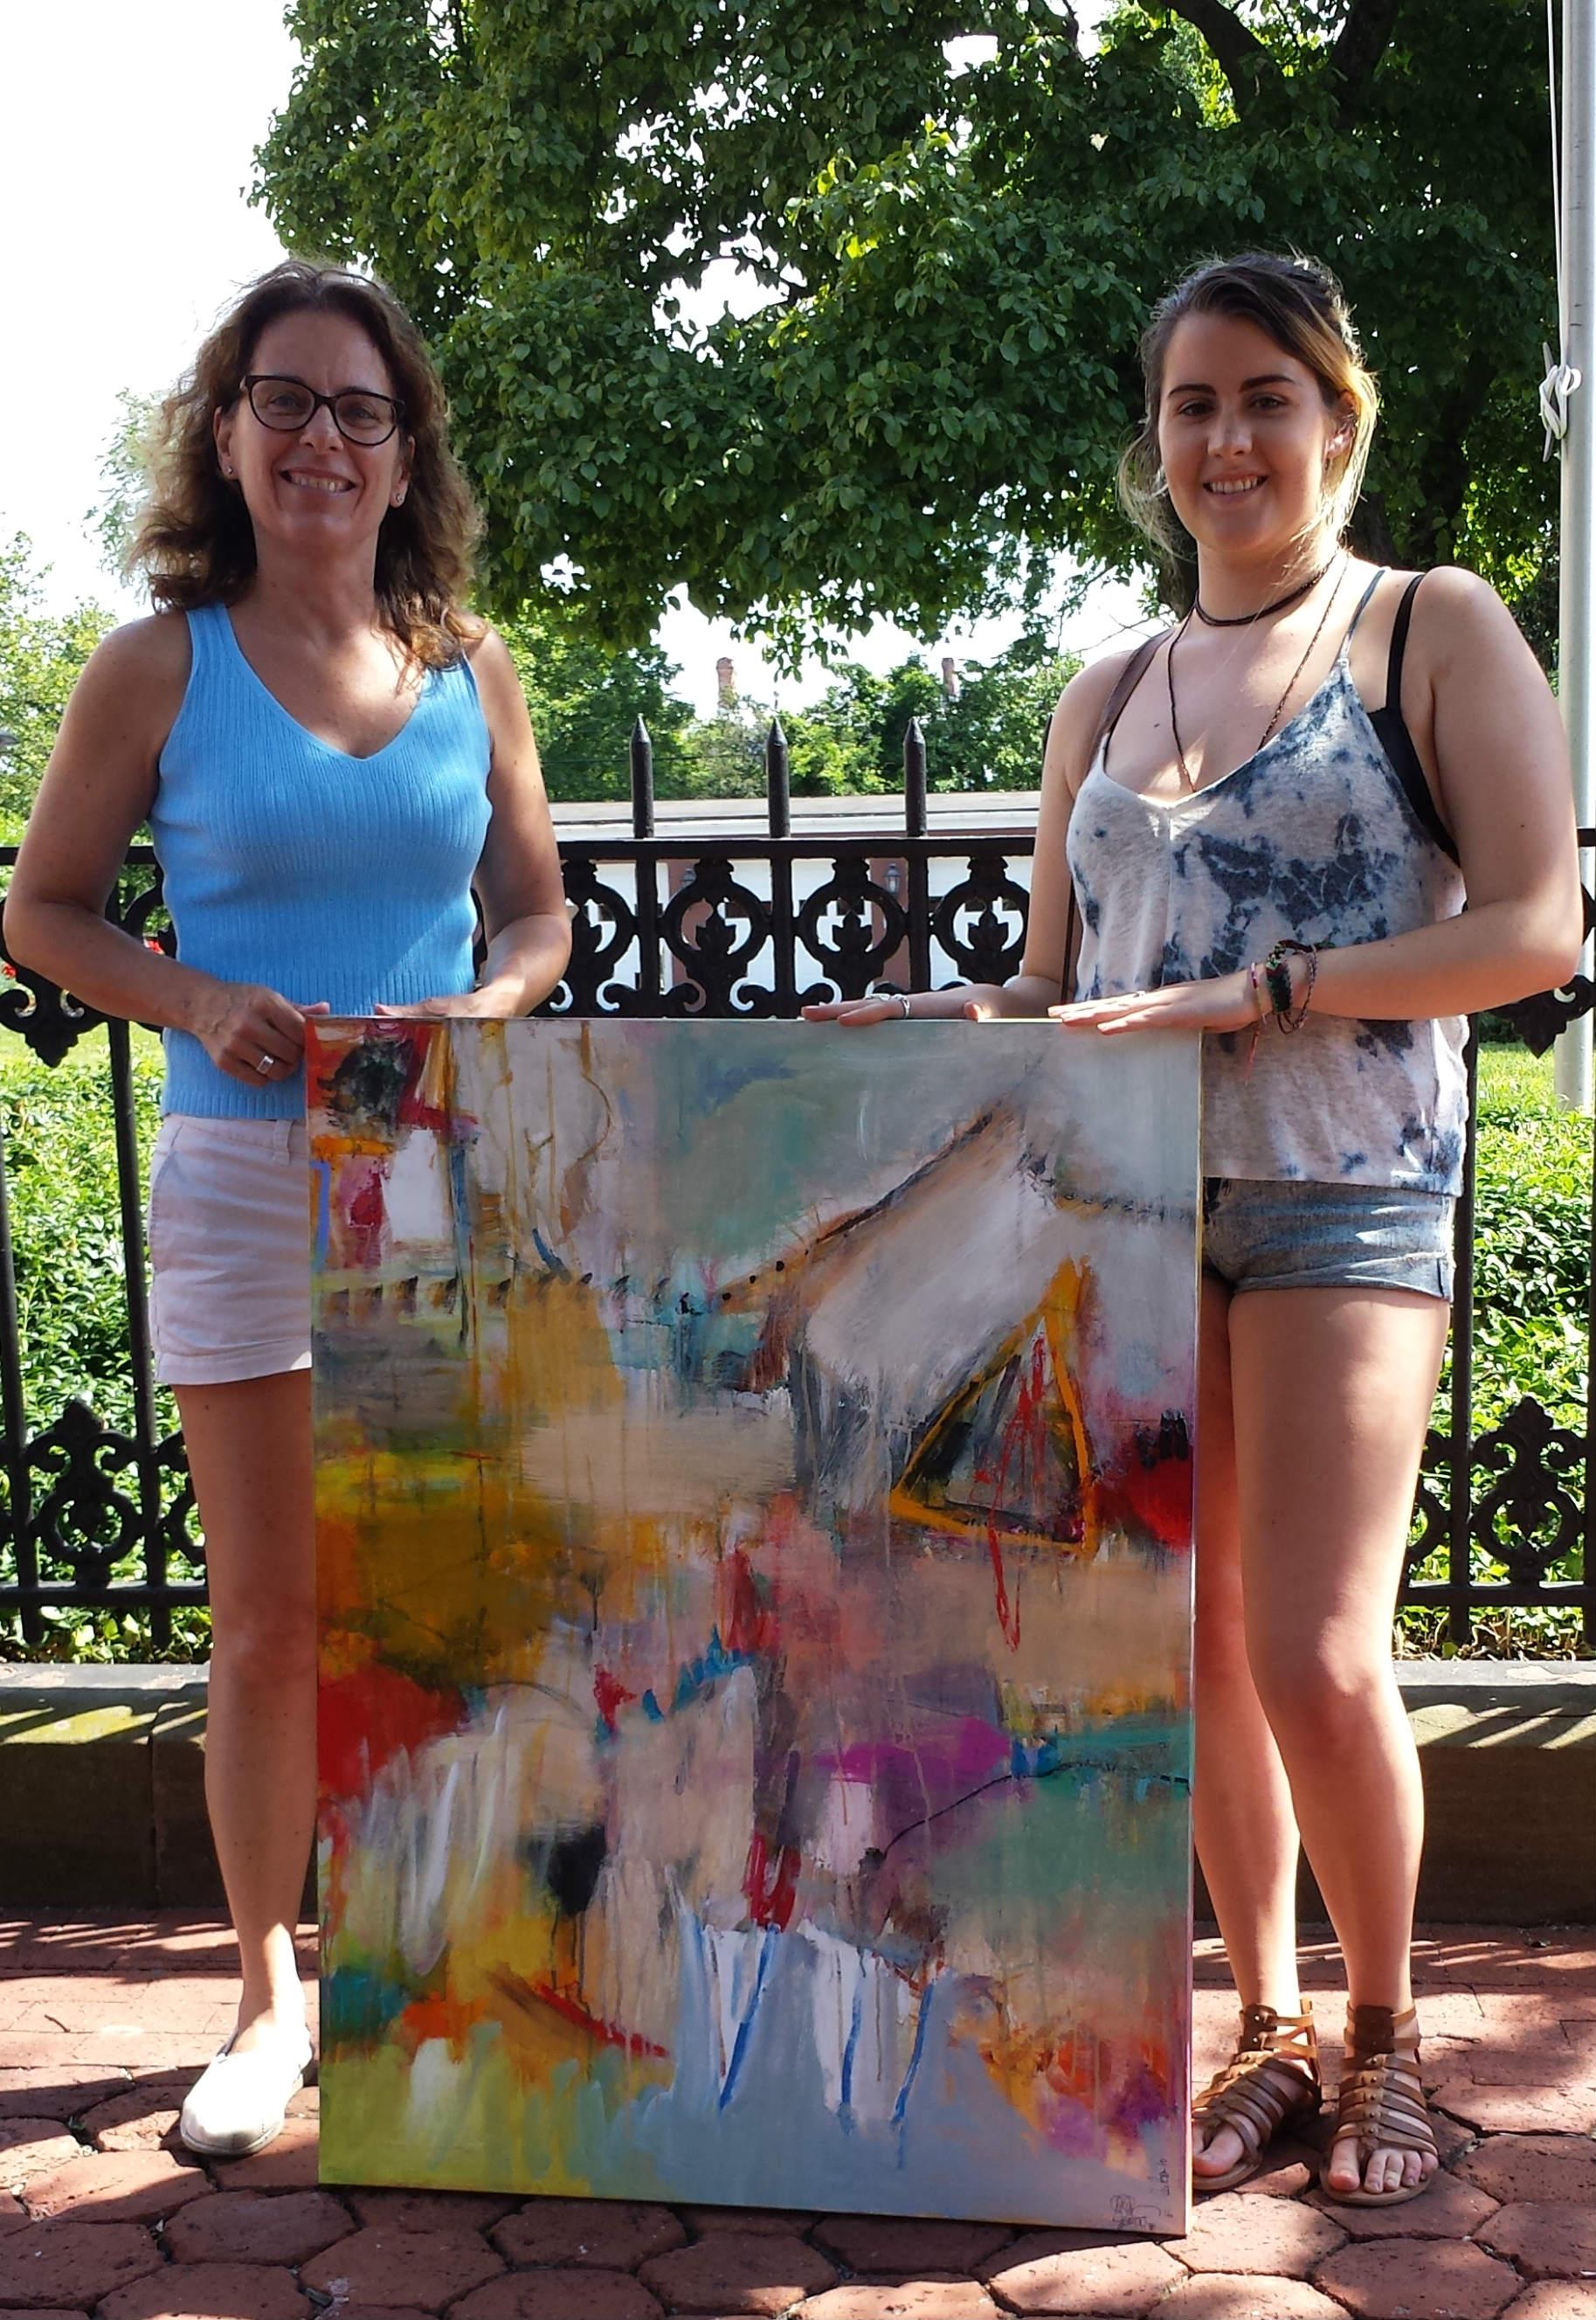 Beth Becker and Emily Hanner